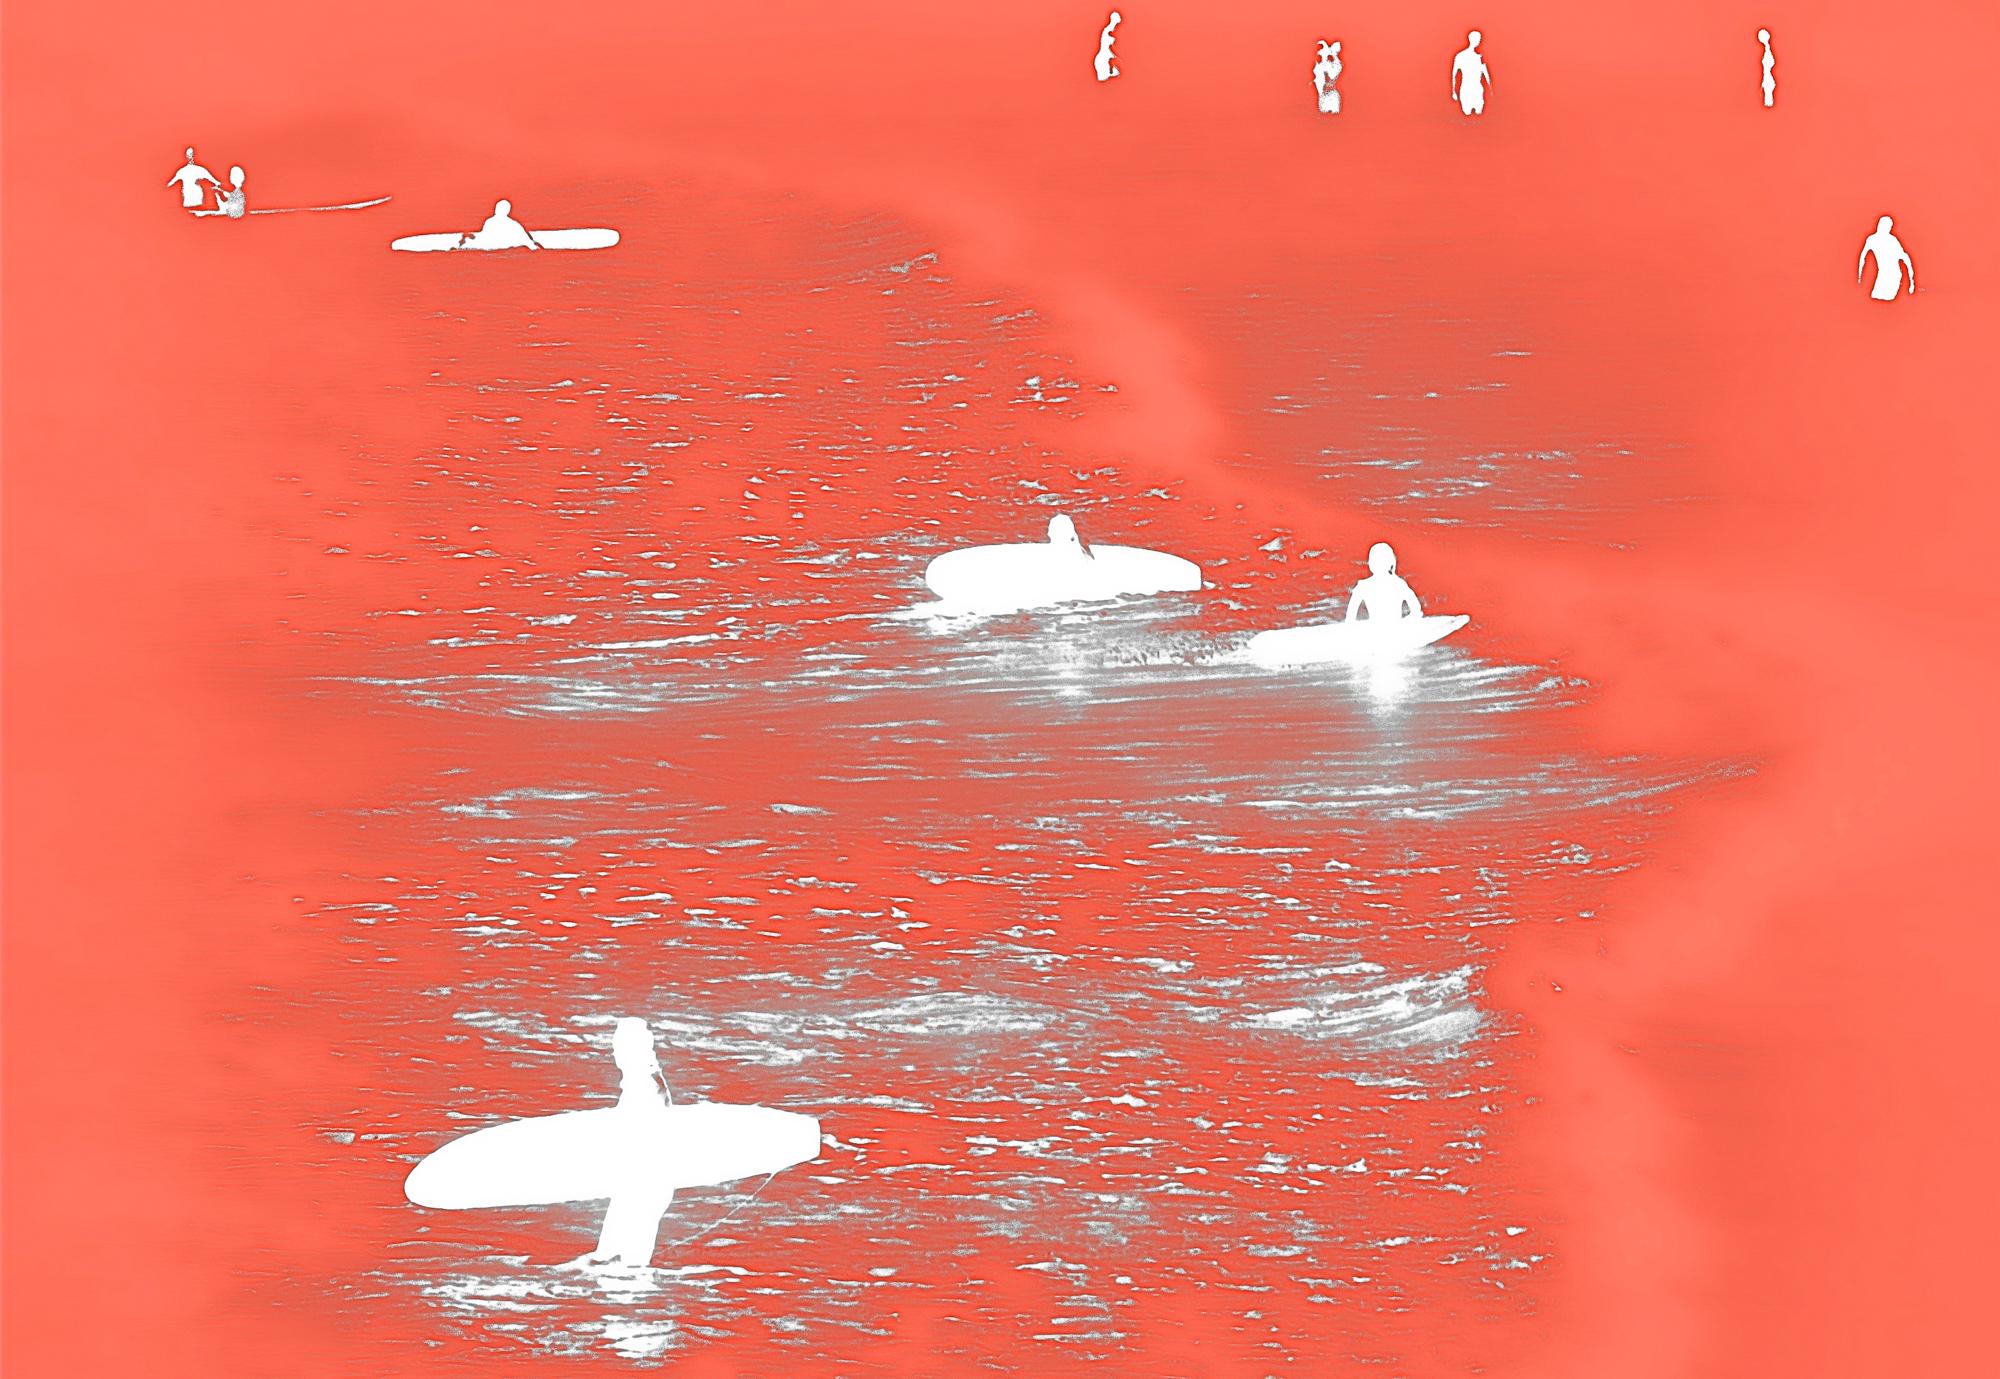 White Surfers on Orange